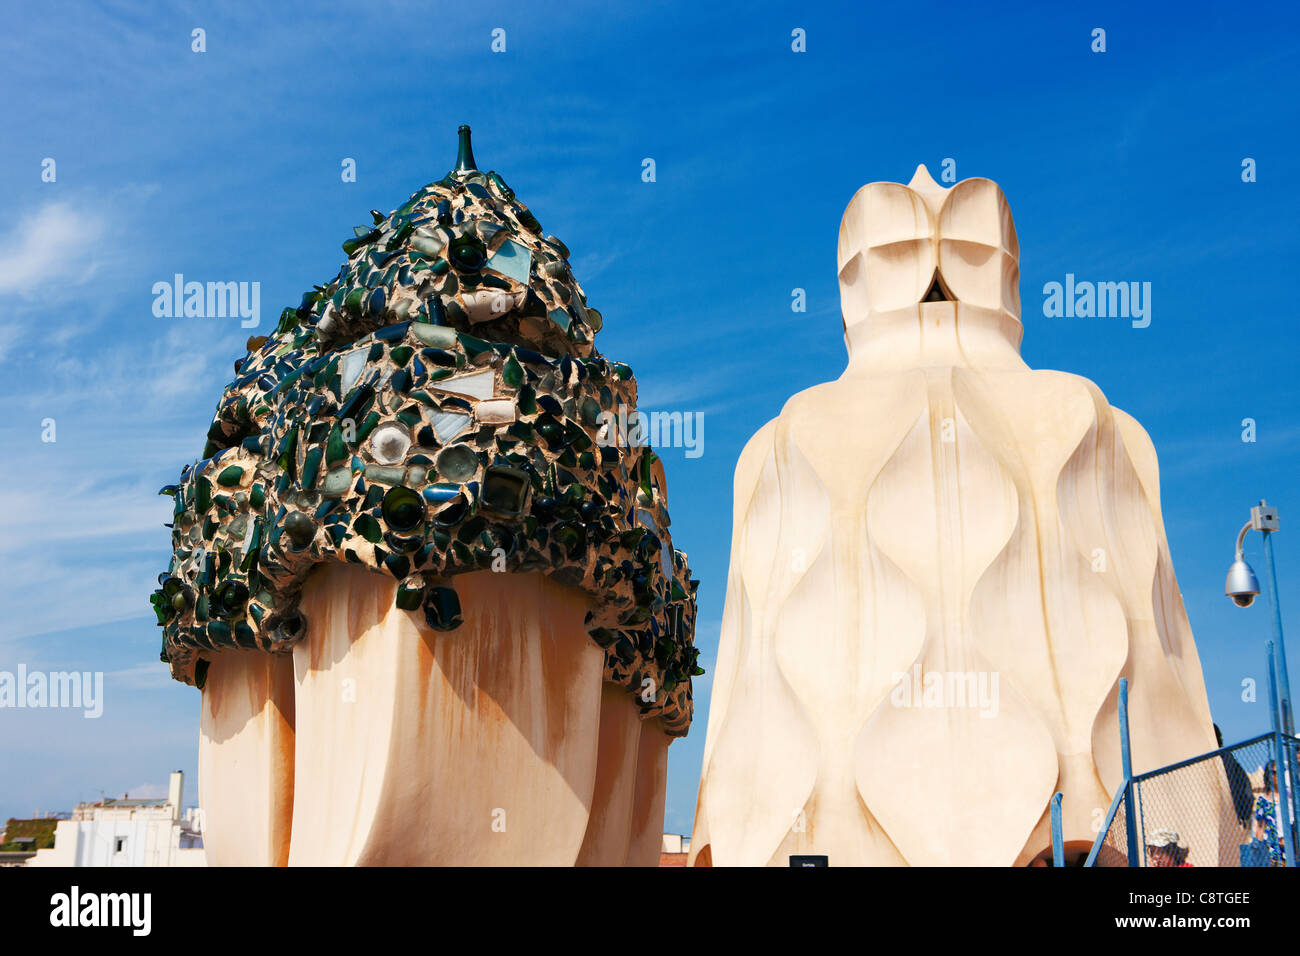 Chimneys on the rooftop of Casa Mila, or 'La Pedrera' building. Barcelona, Catalonia, Spain. - Stock Image